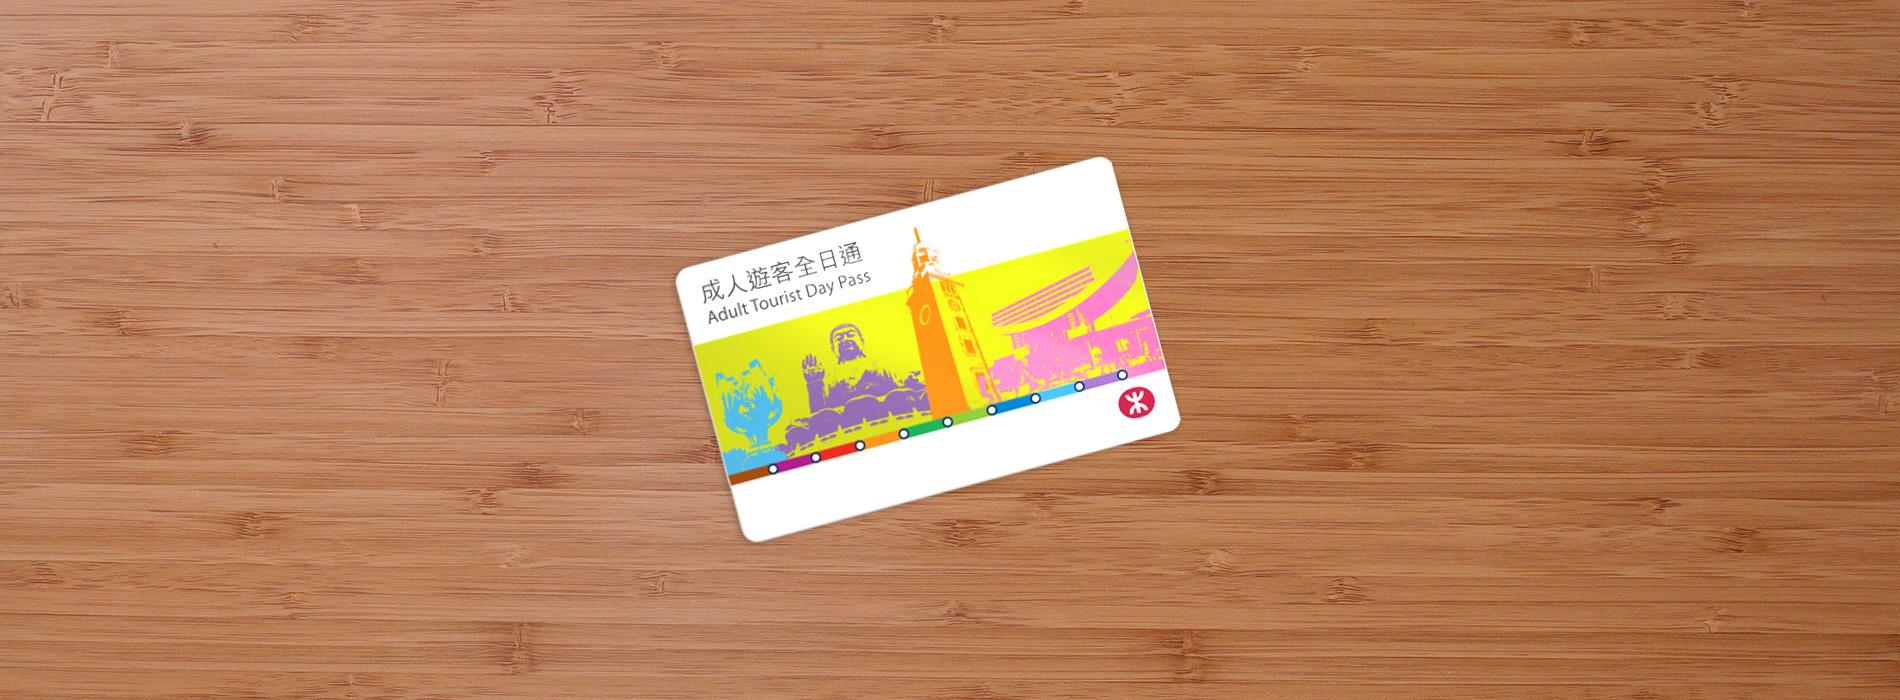 Hong Kong Adult Tourist Day Pass Image